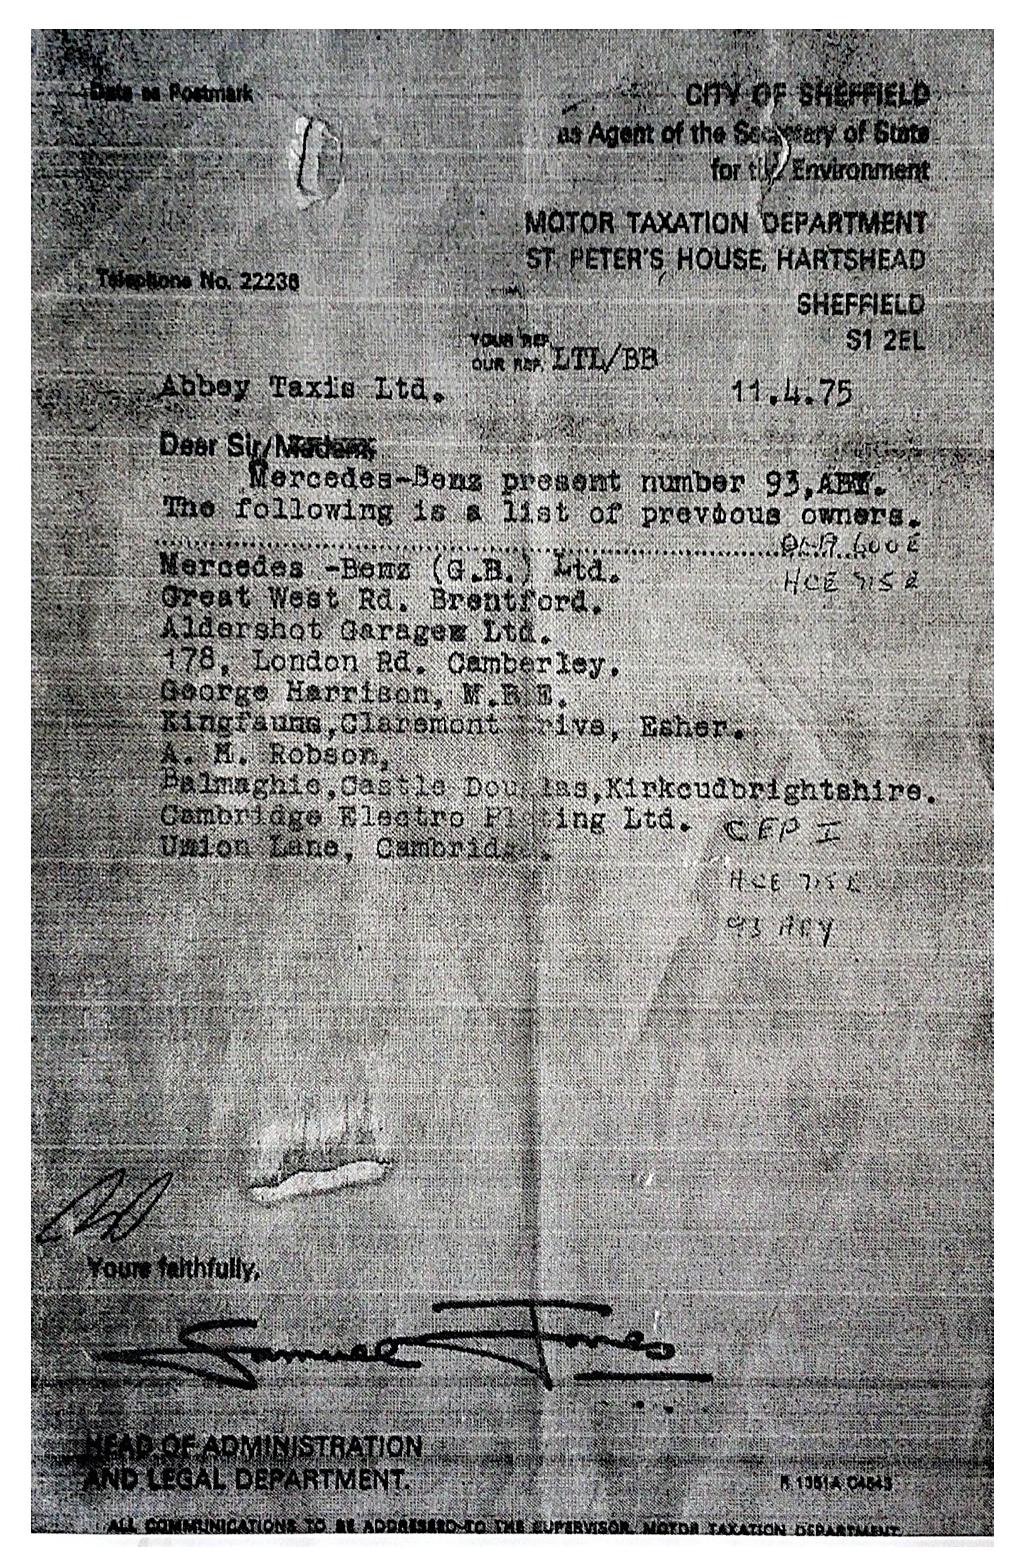 George Harrison Mercedes-Benz 600 documentation